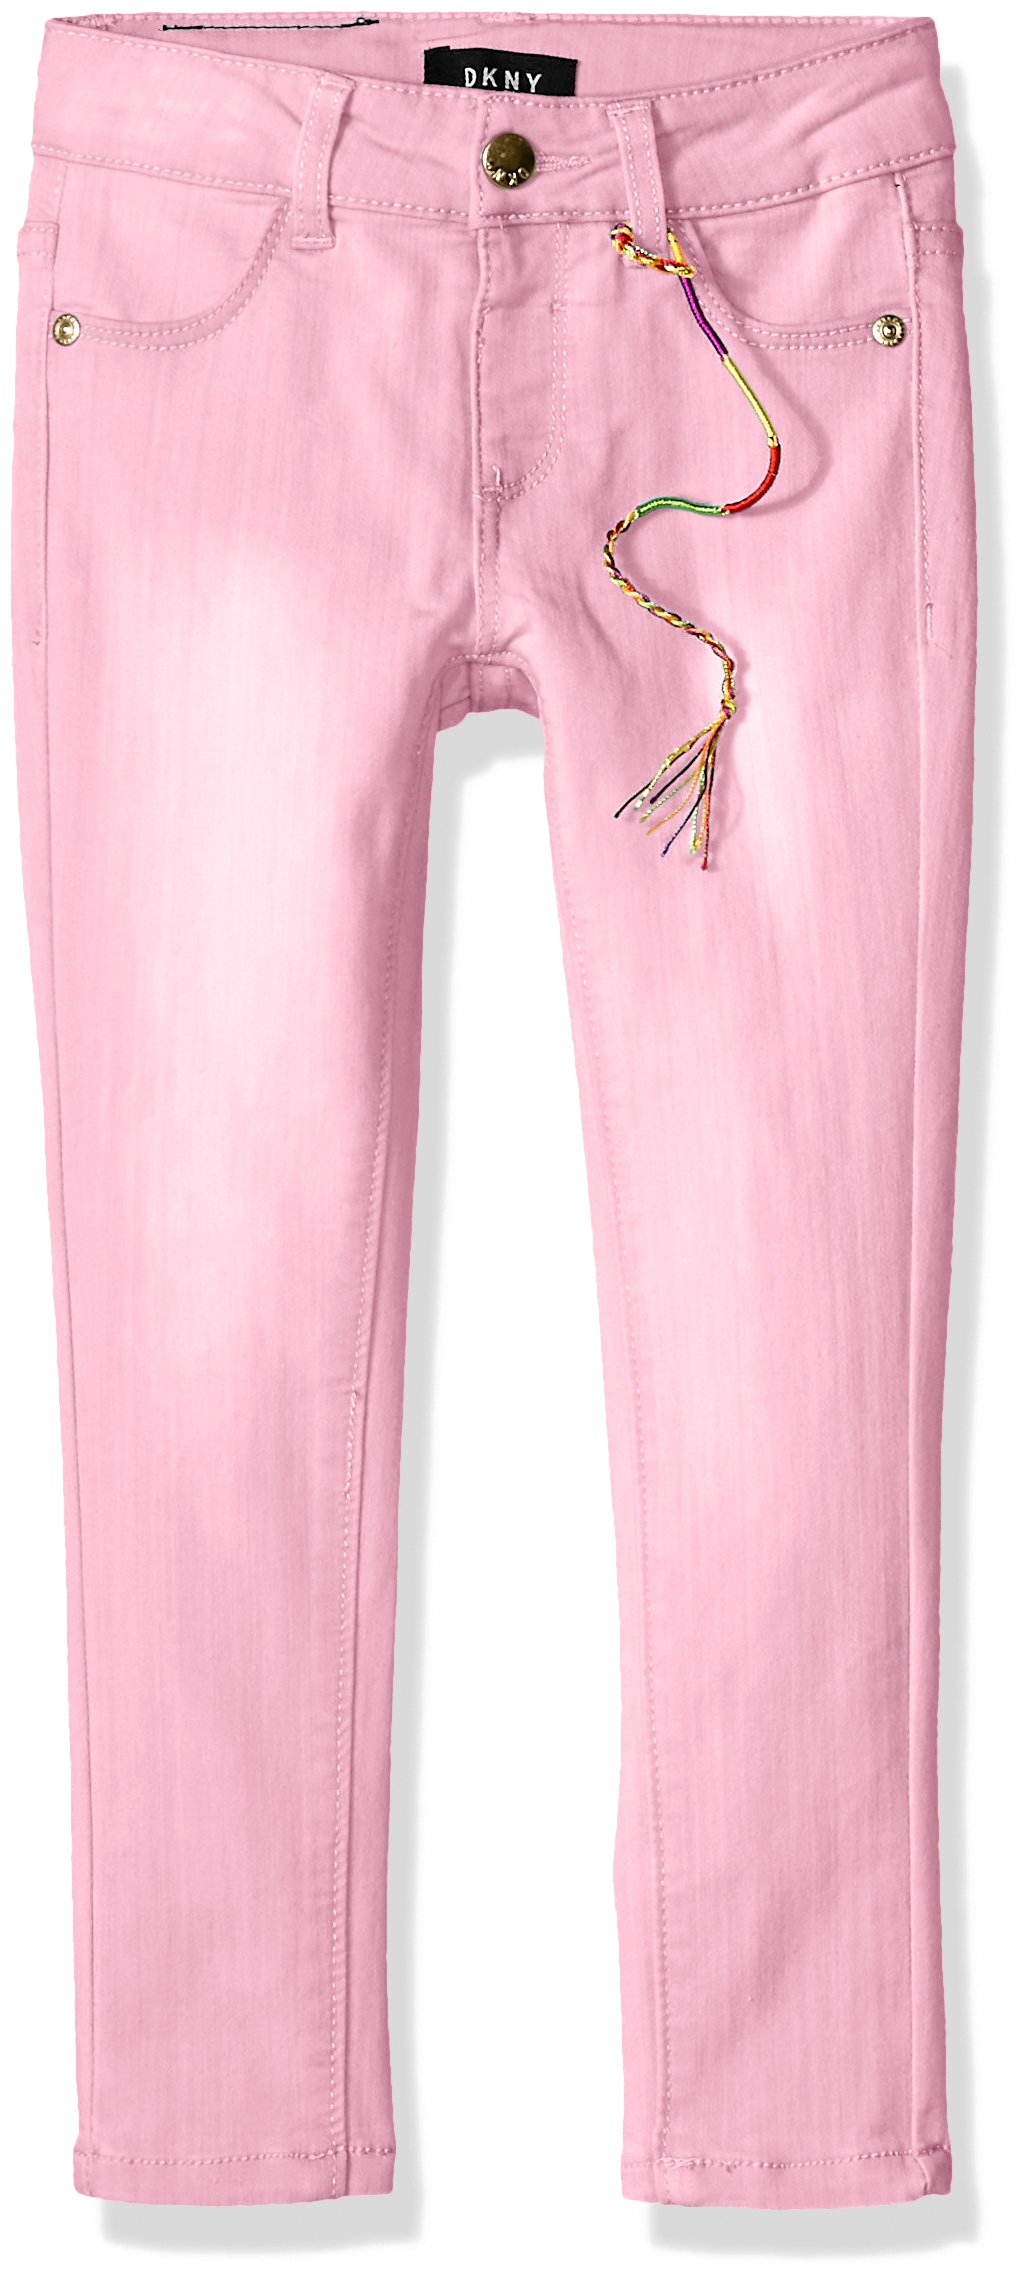 DKNY Big Girls' Jean, Colored Jegging Lilac Sachet, 8